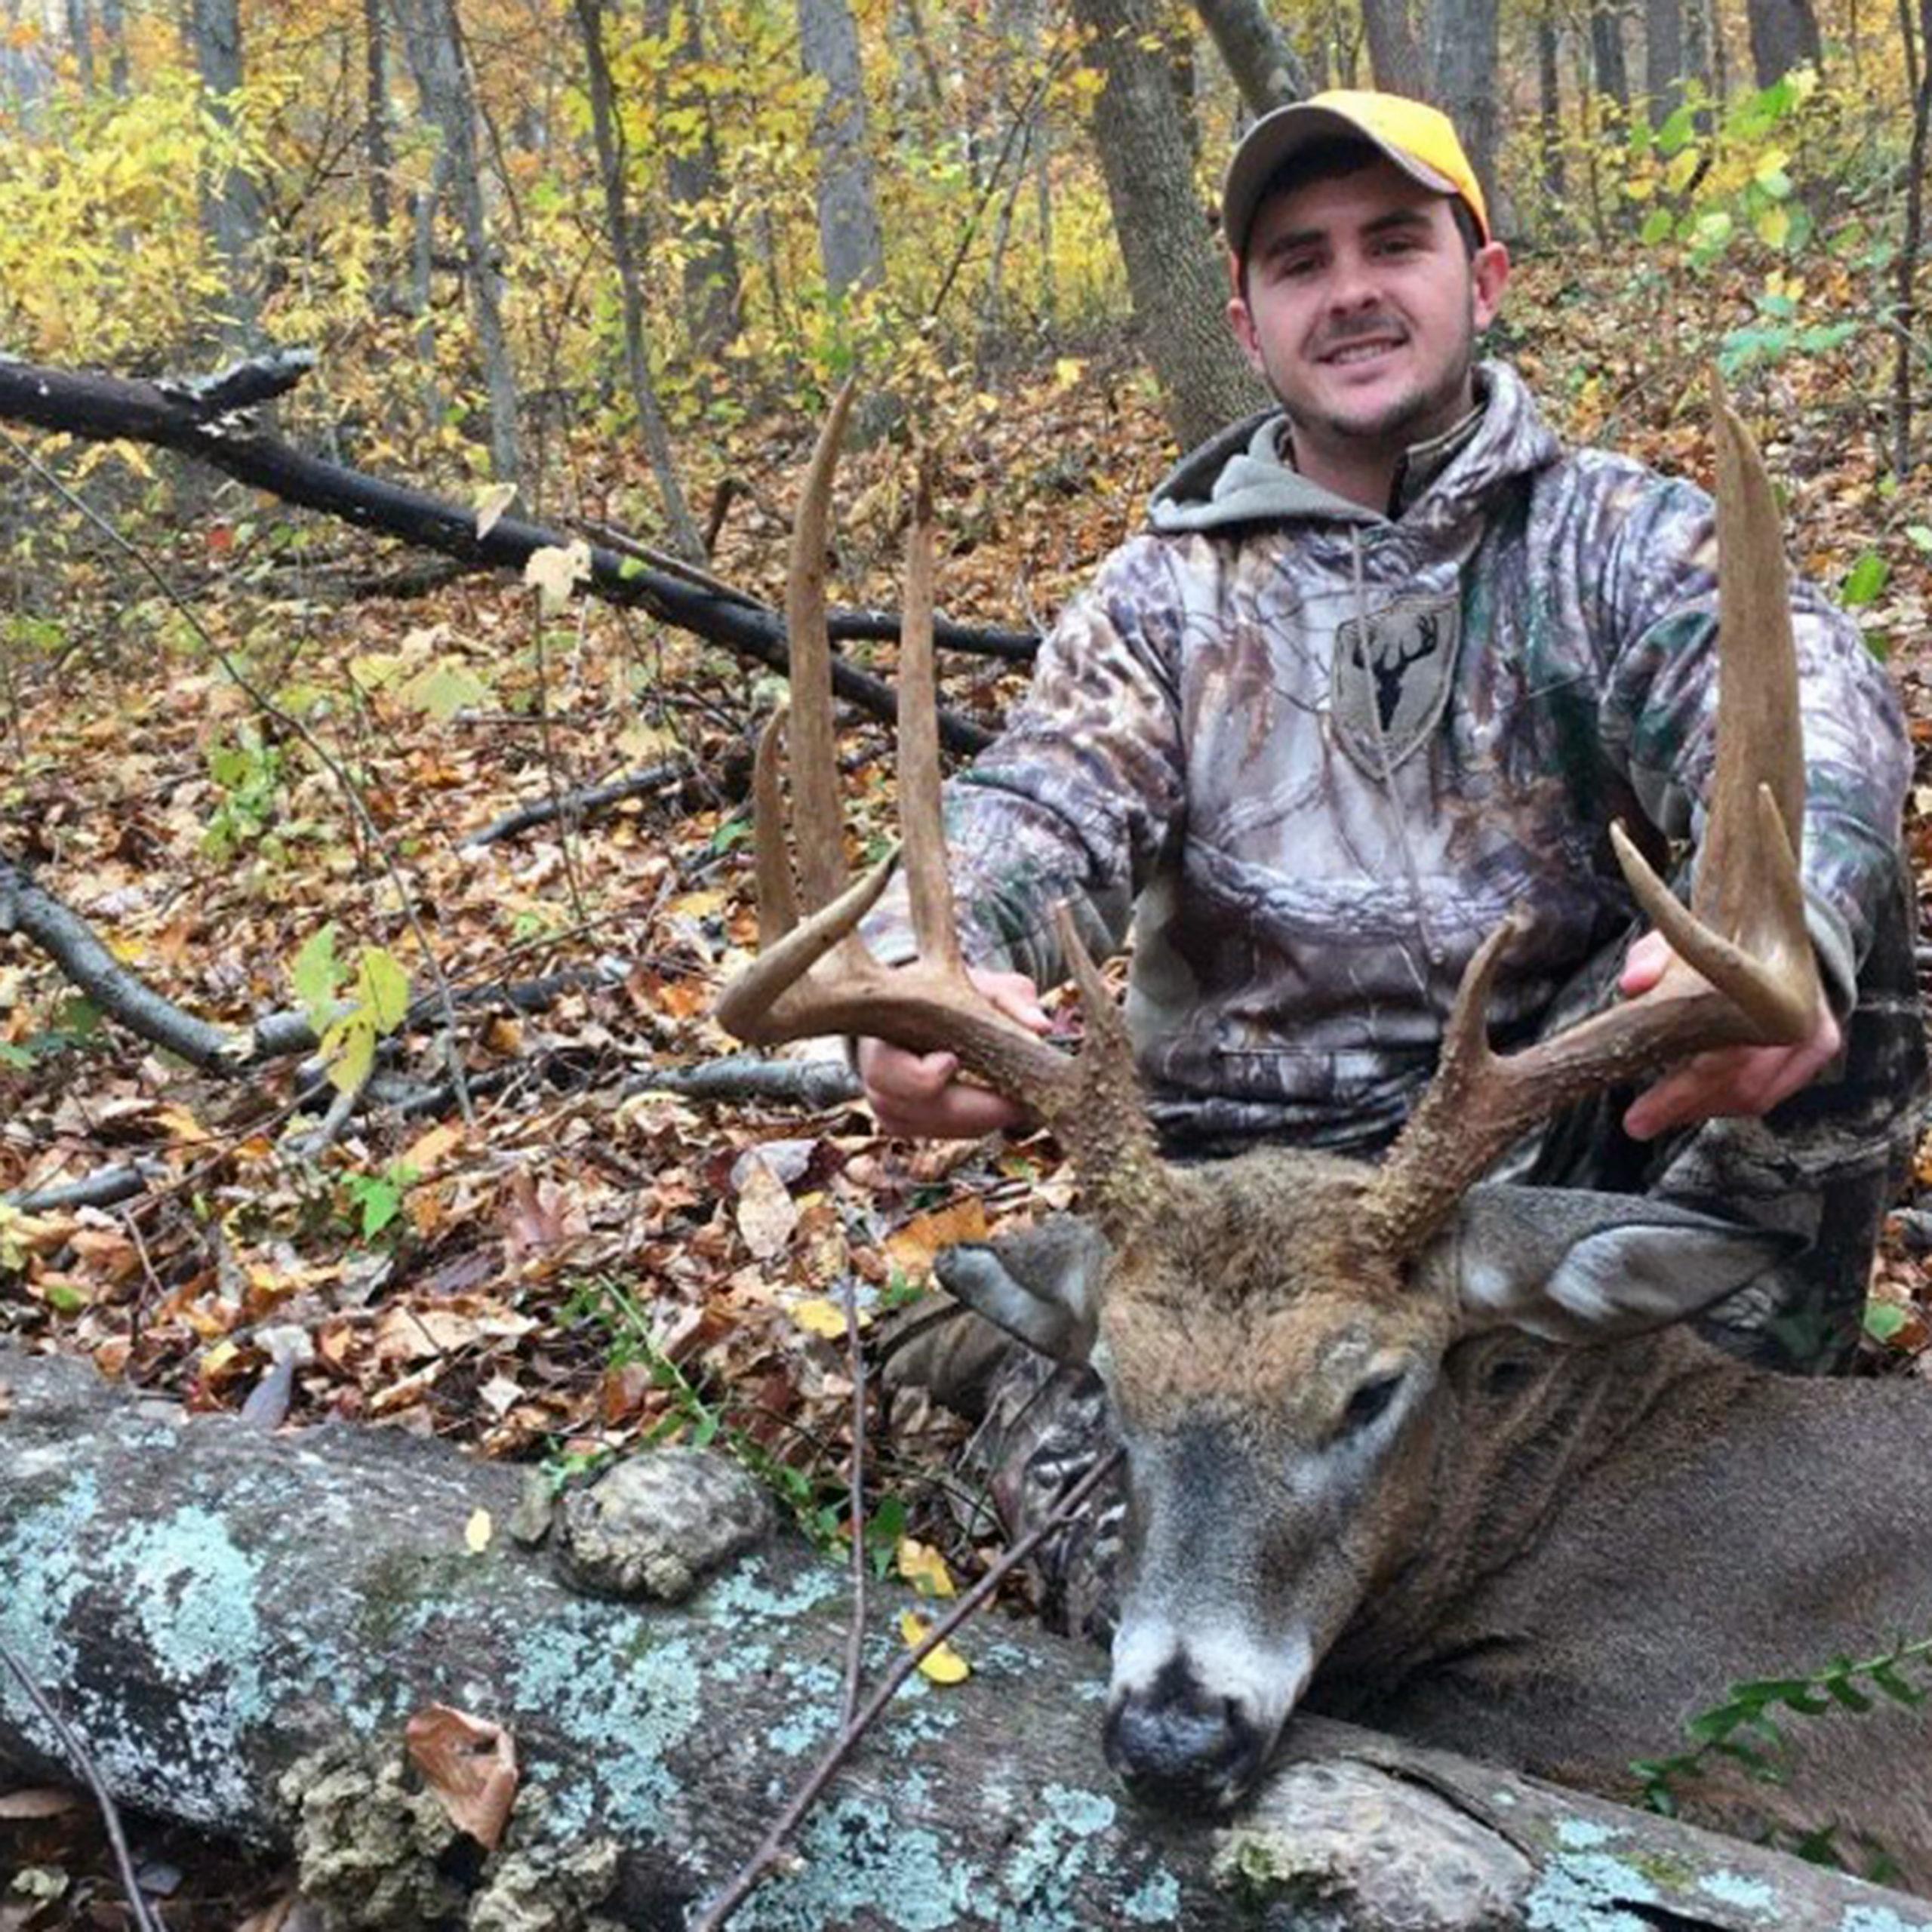 Deer Hunting at Graves Mountain Farm & Lodges i Syria VA on the Blue Ridge of VA